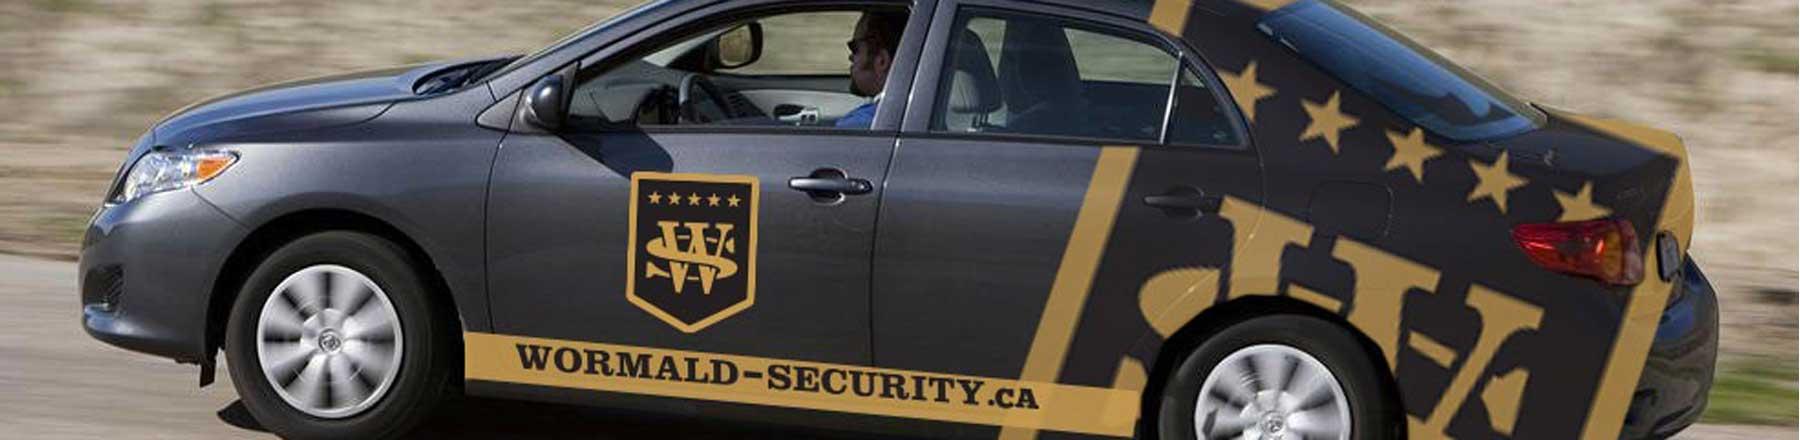 Wormald Security